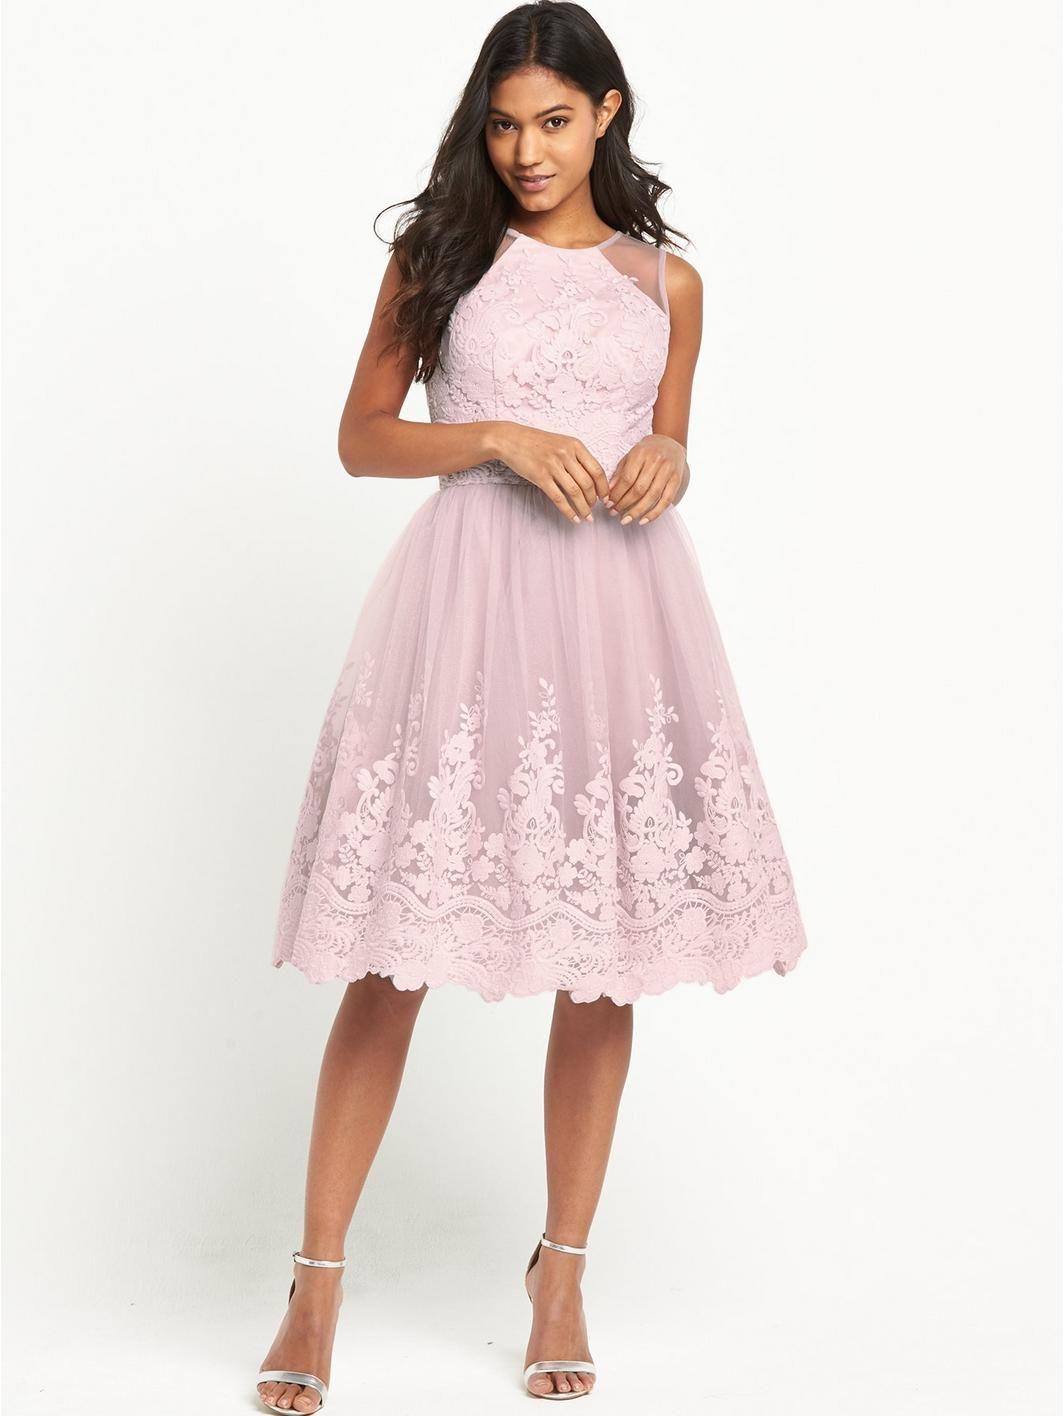 Premium lace and embroidered prom dressu pretty stuff pinterest